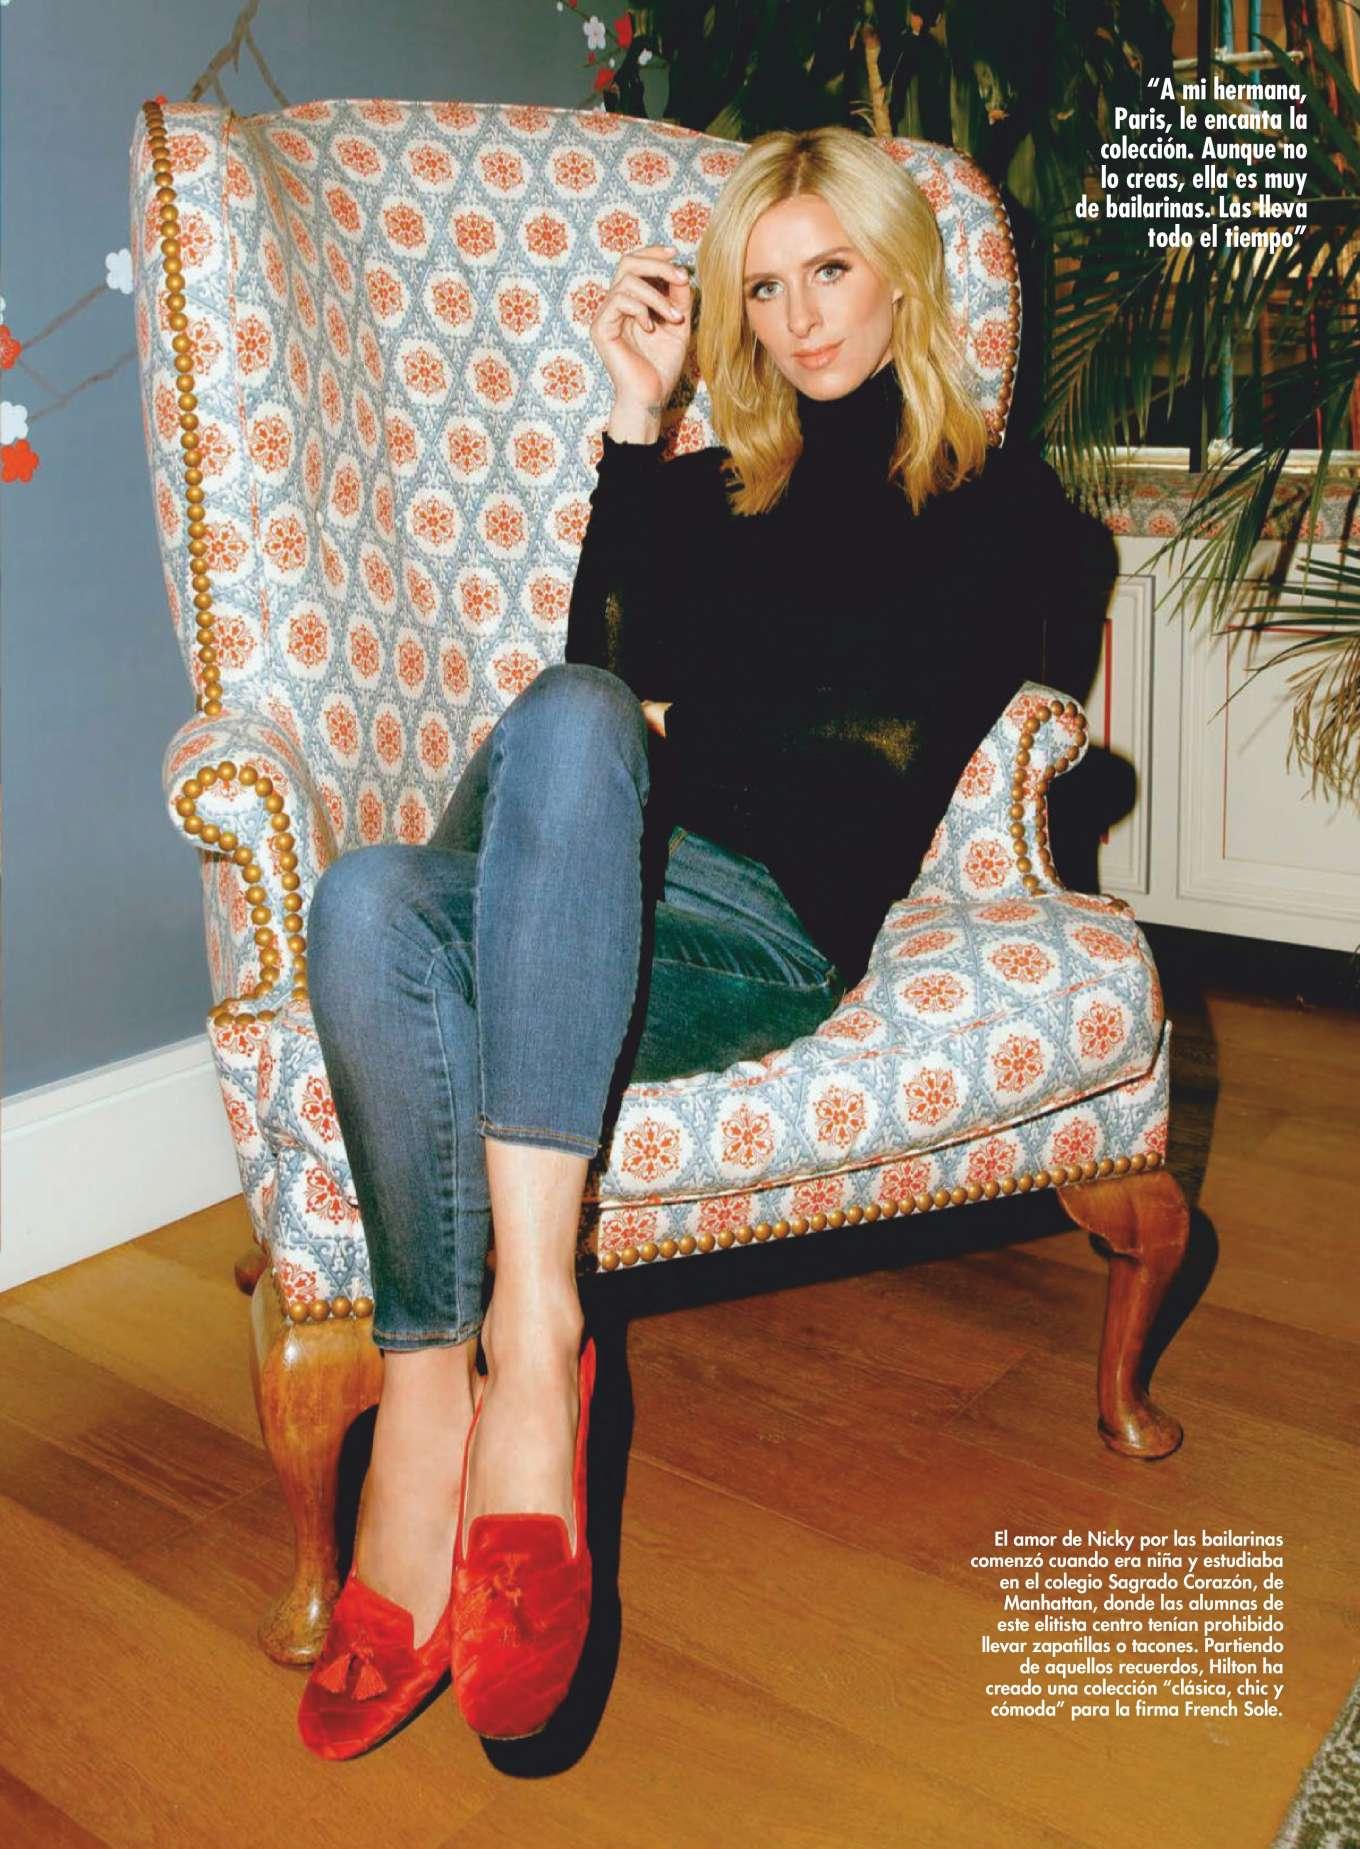 Nicky Hilton - Hola! US en Espanol Magazine (December 2019/January 2020)